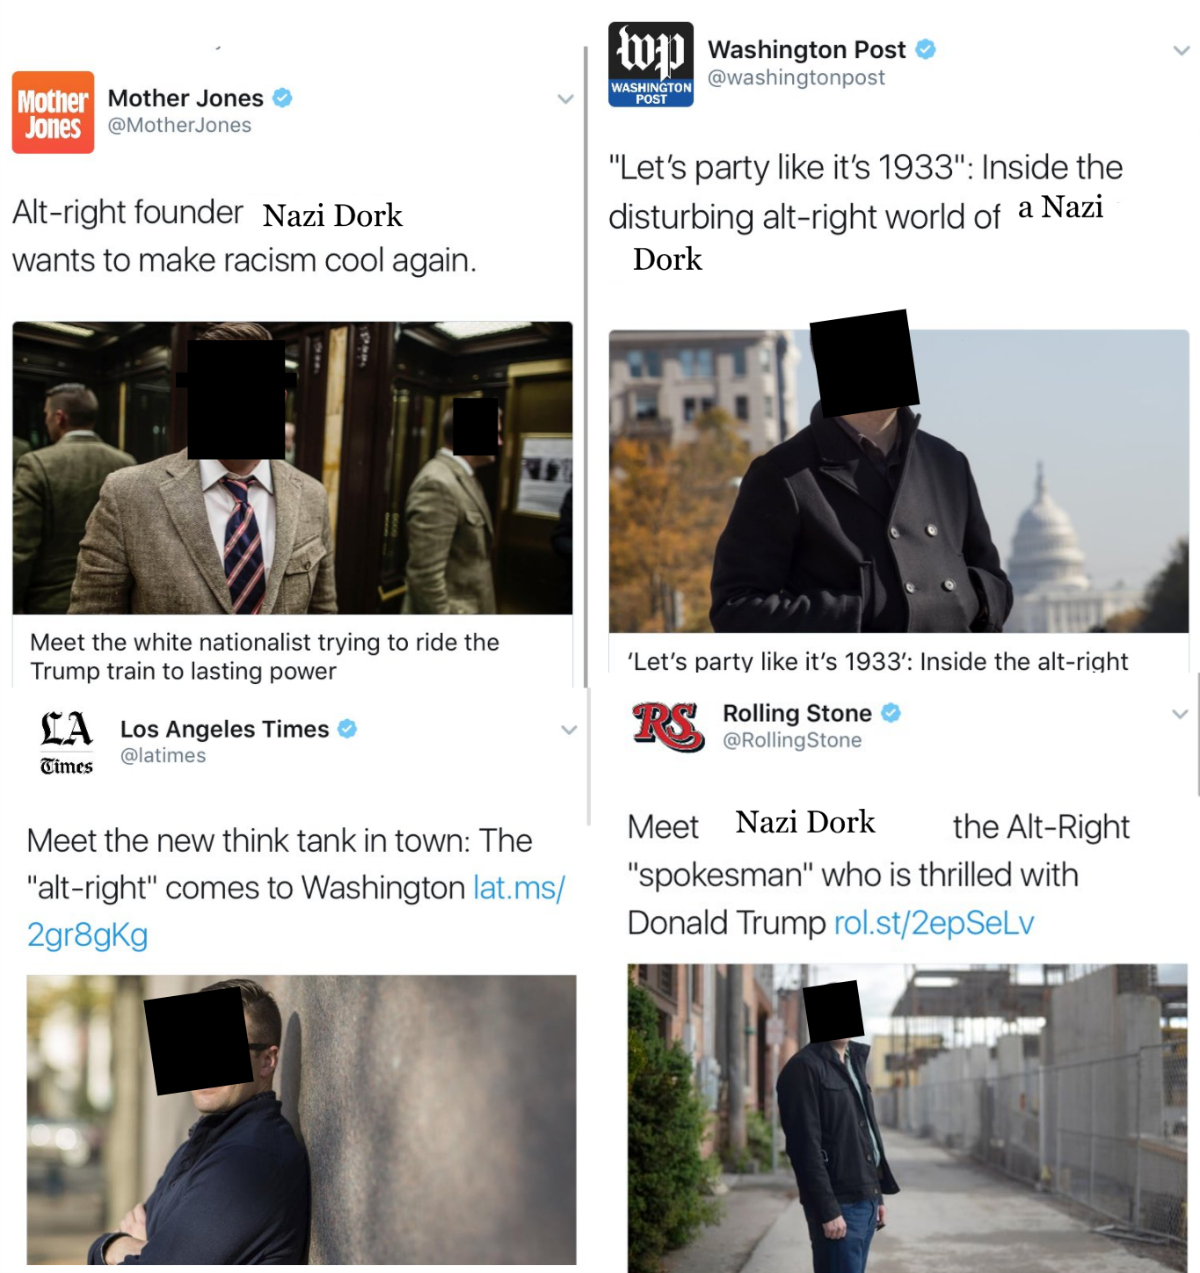 Twitter promotion of the Nazi Dork